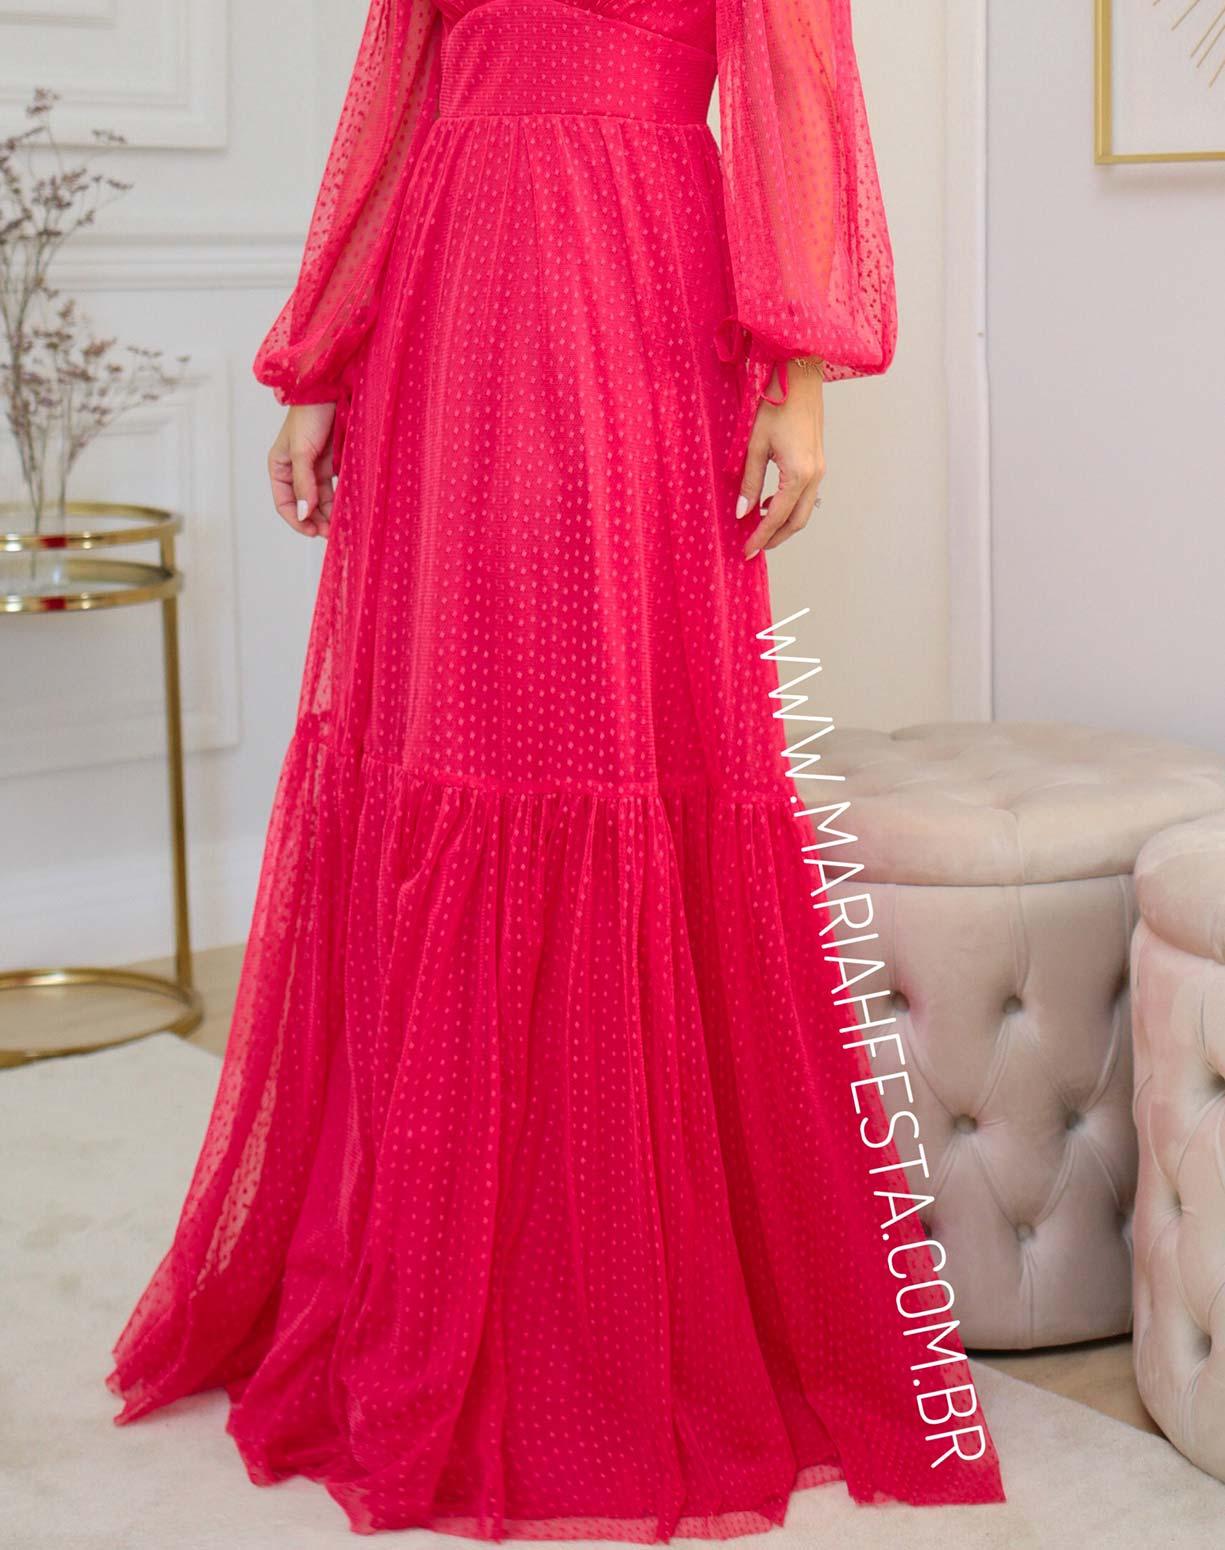 Vestido Rosa Pink Manga Longa em Tule Texturizado